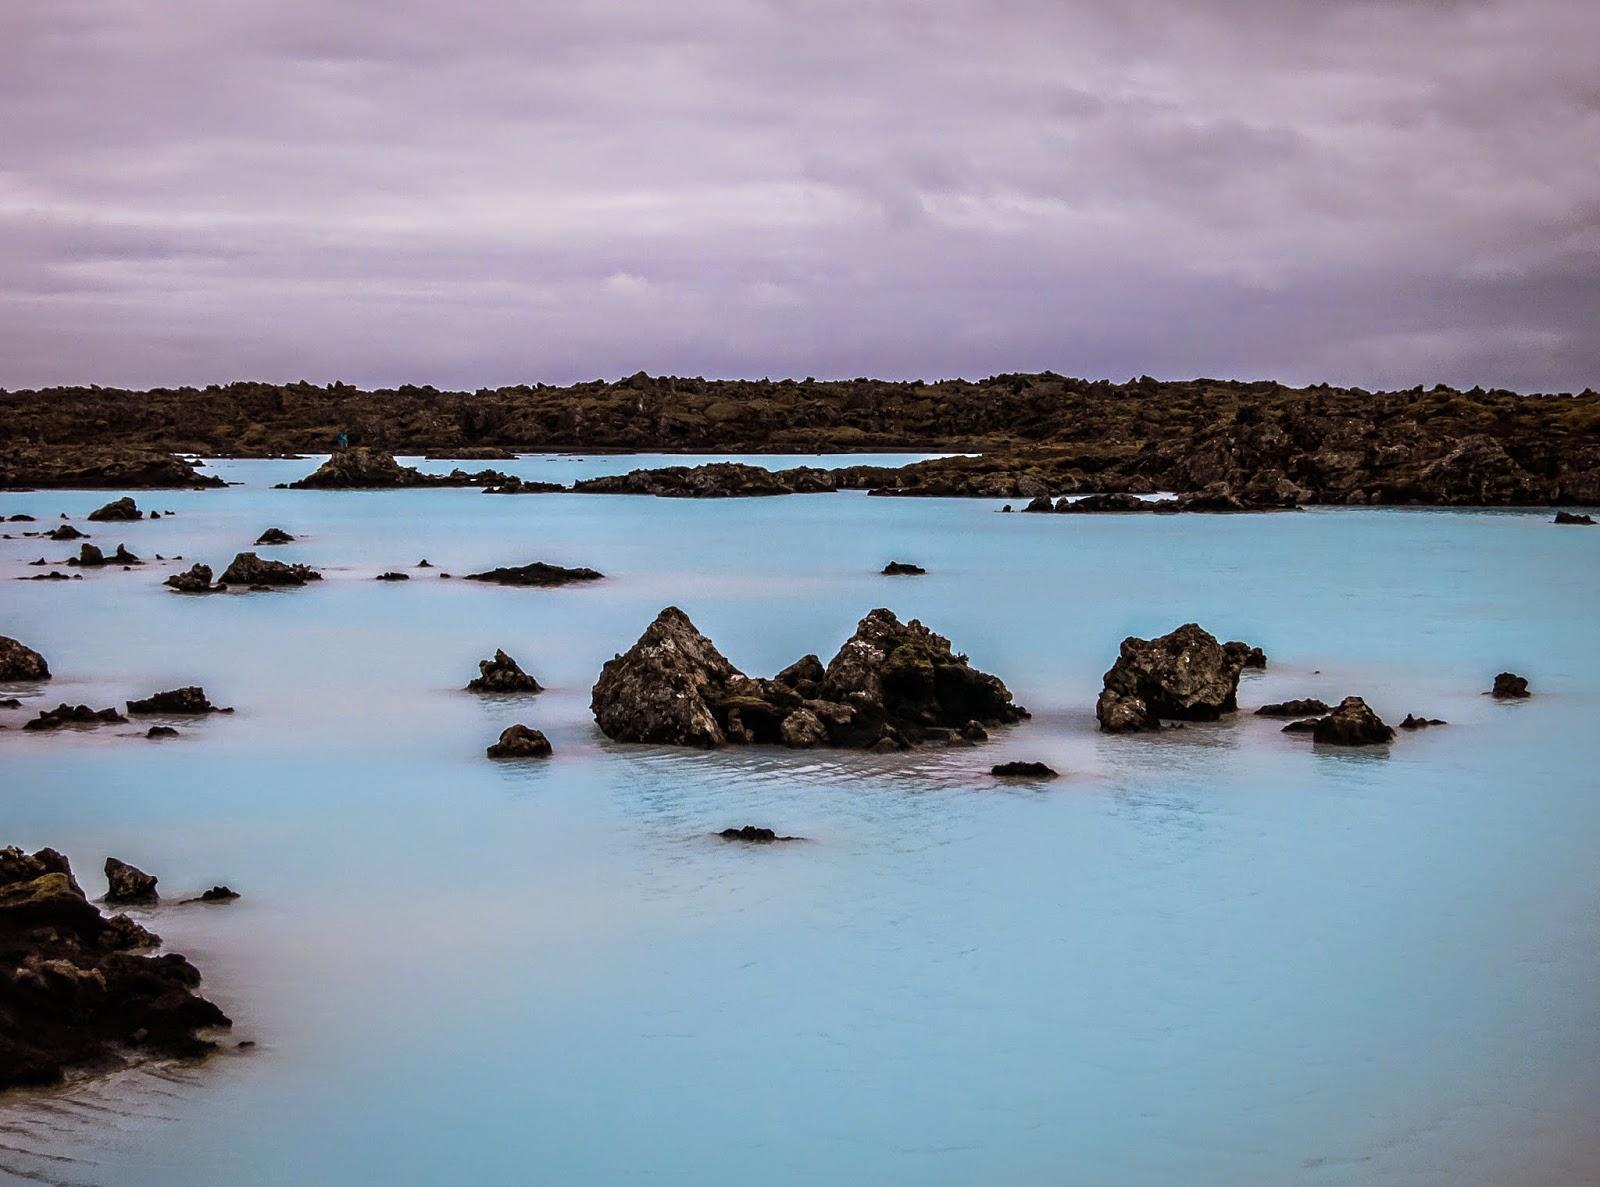 Blue Lagoon - La laguna azul